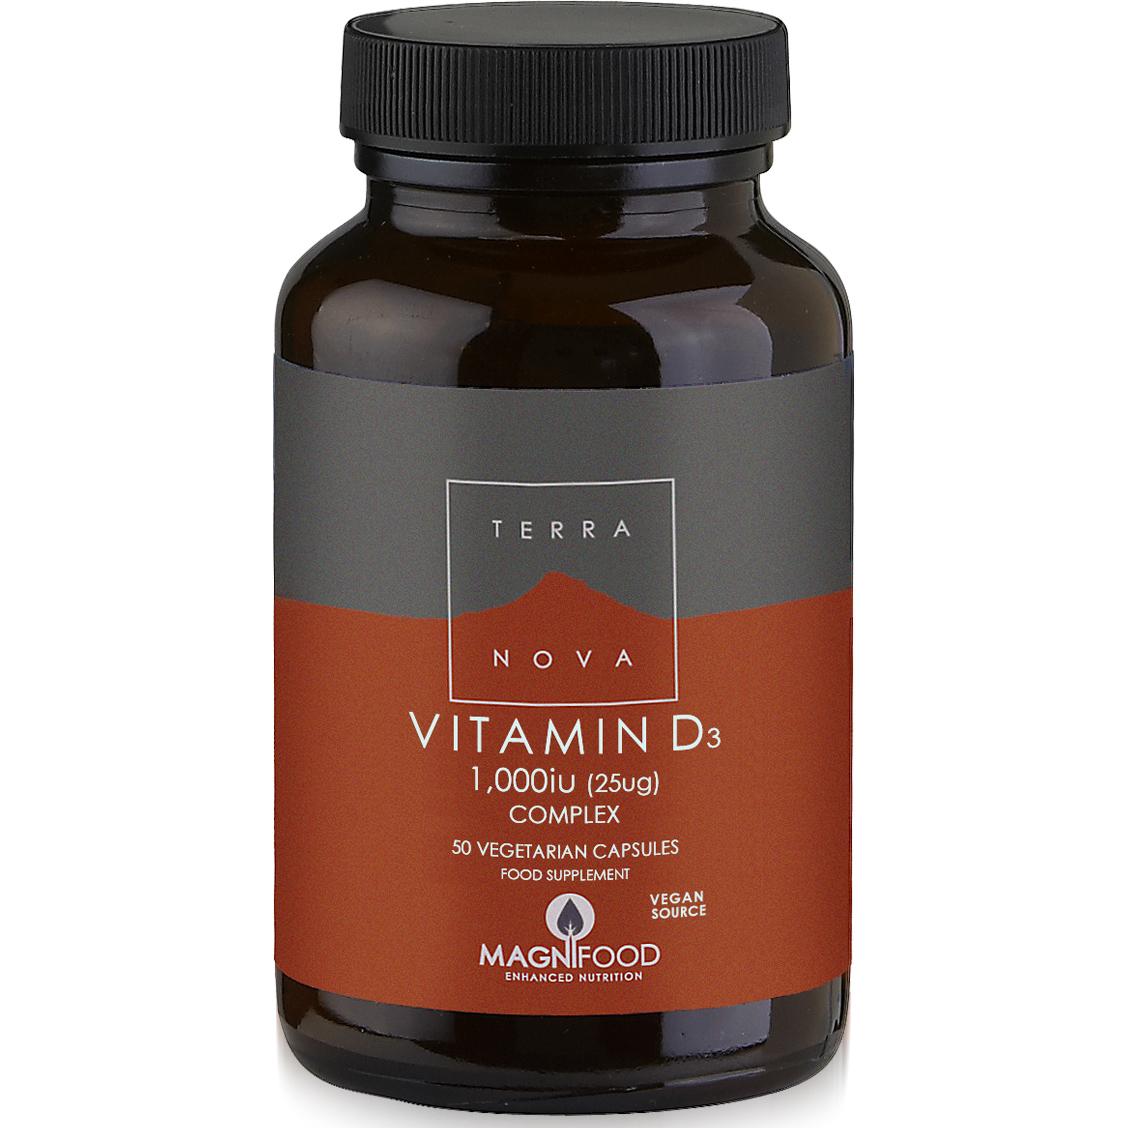 Terranova Vitamin D3 1000iu Complex Φυτικής Προέλευσης Βιταμίνη D3 50veg.caps